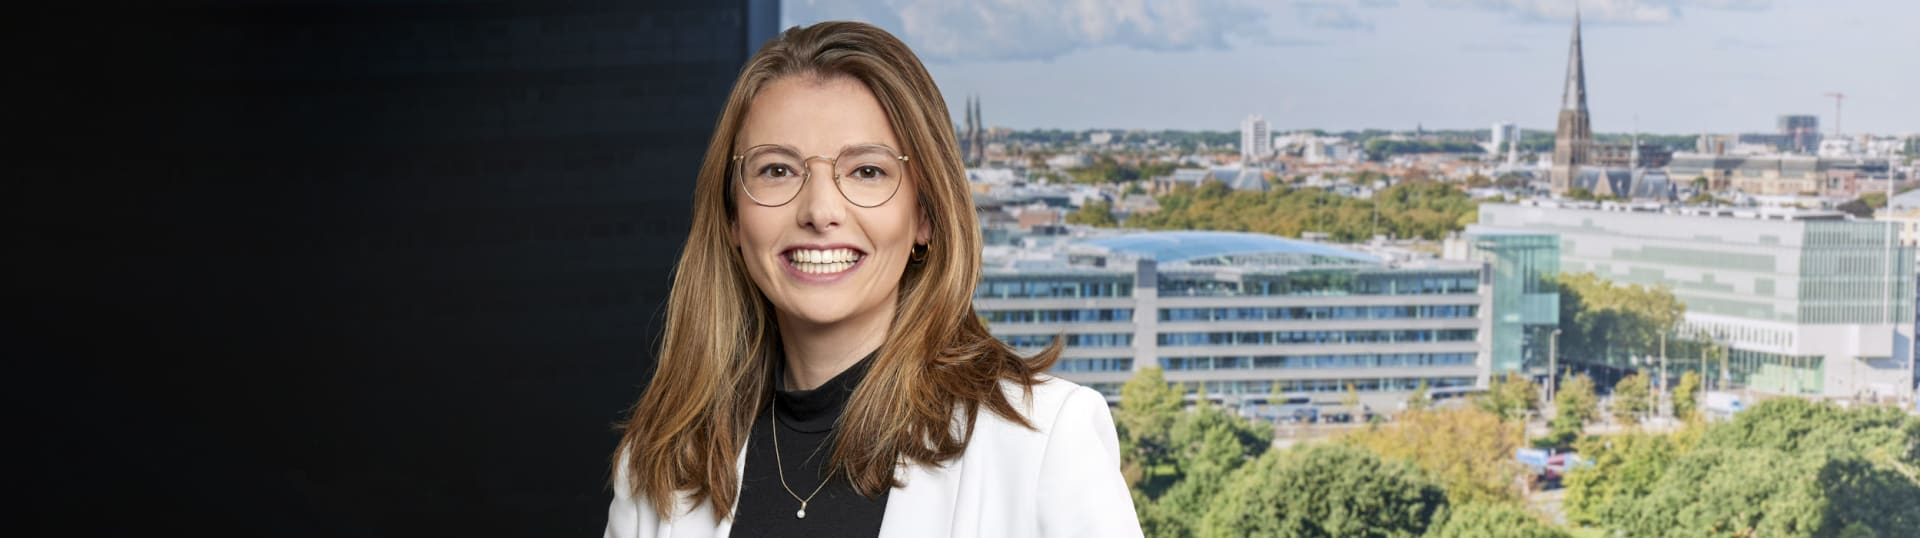 Djamilla Wijnen, advocaat Pels Rijcken